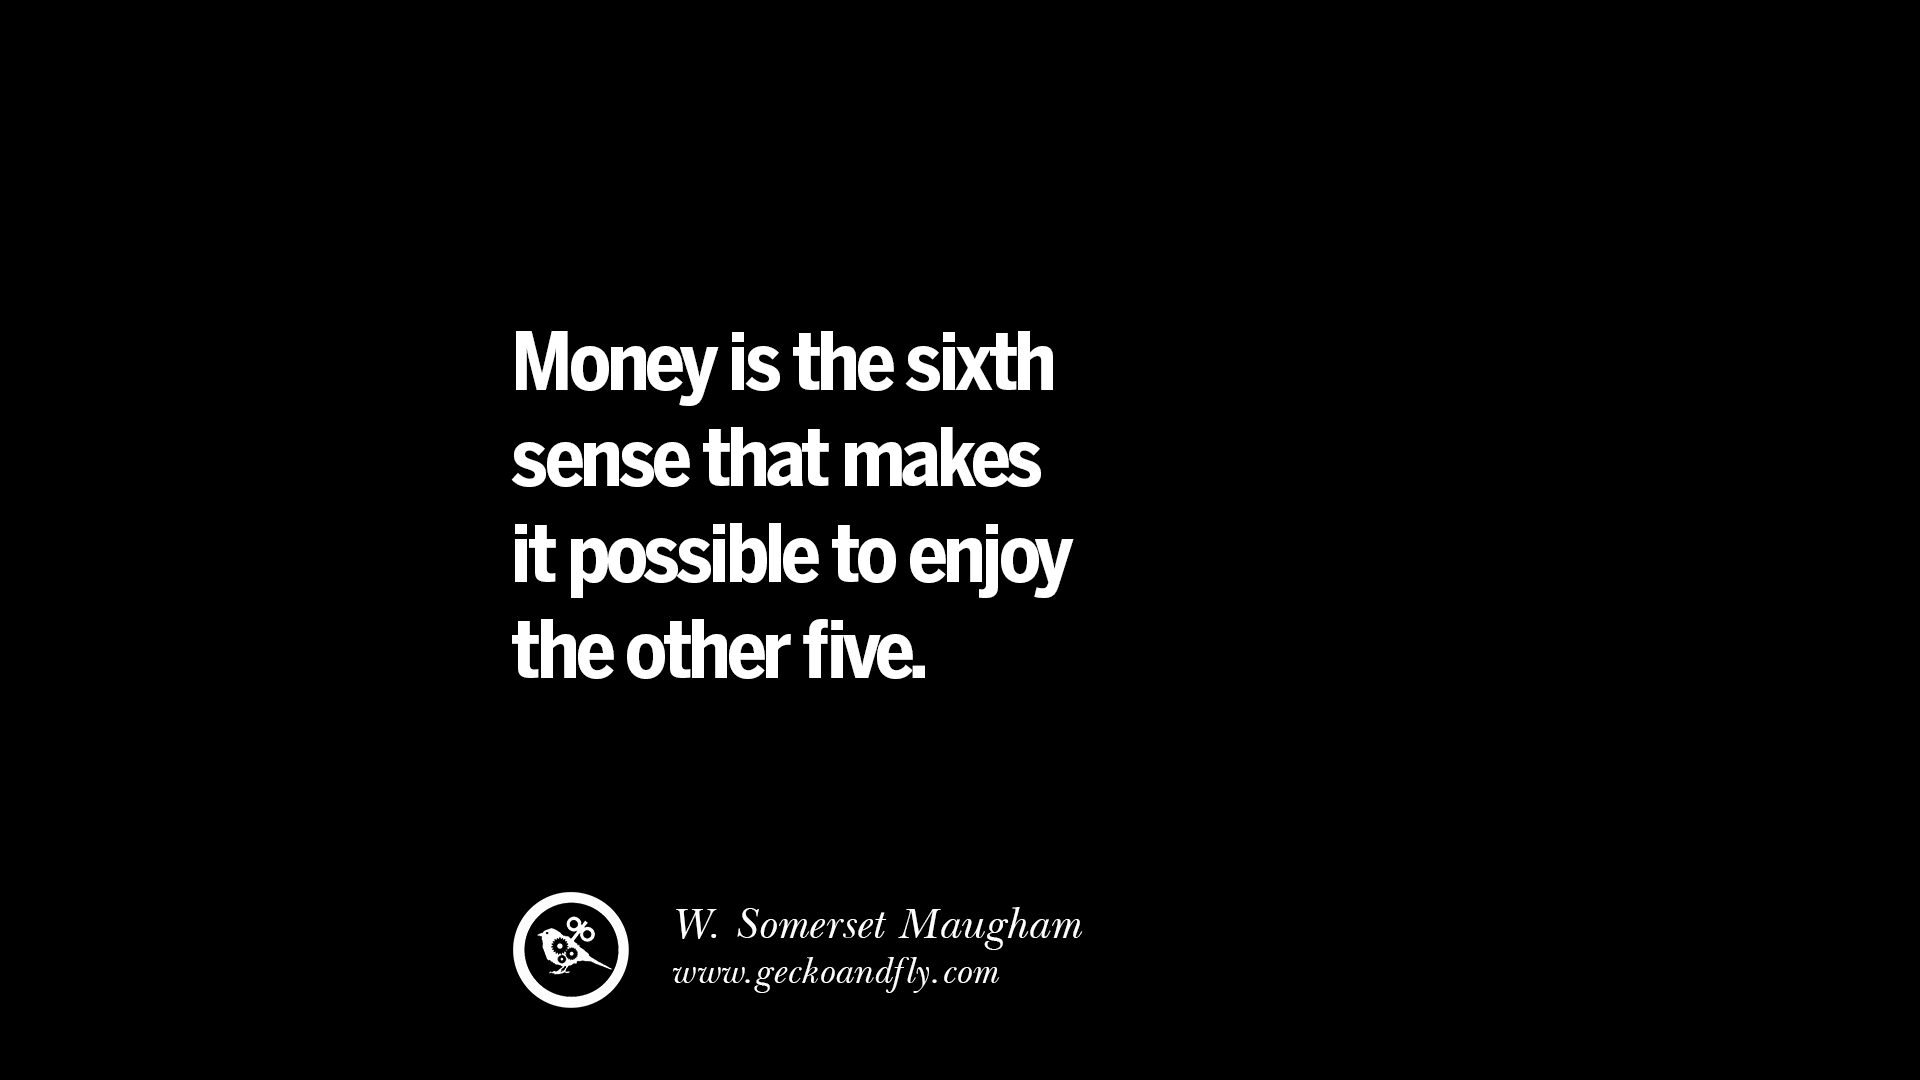 essay on money is the sixth sense